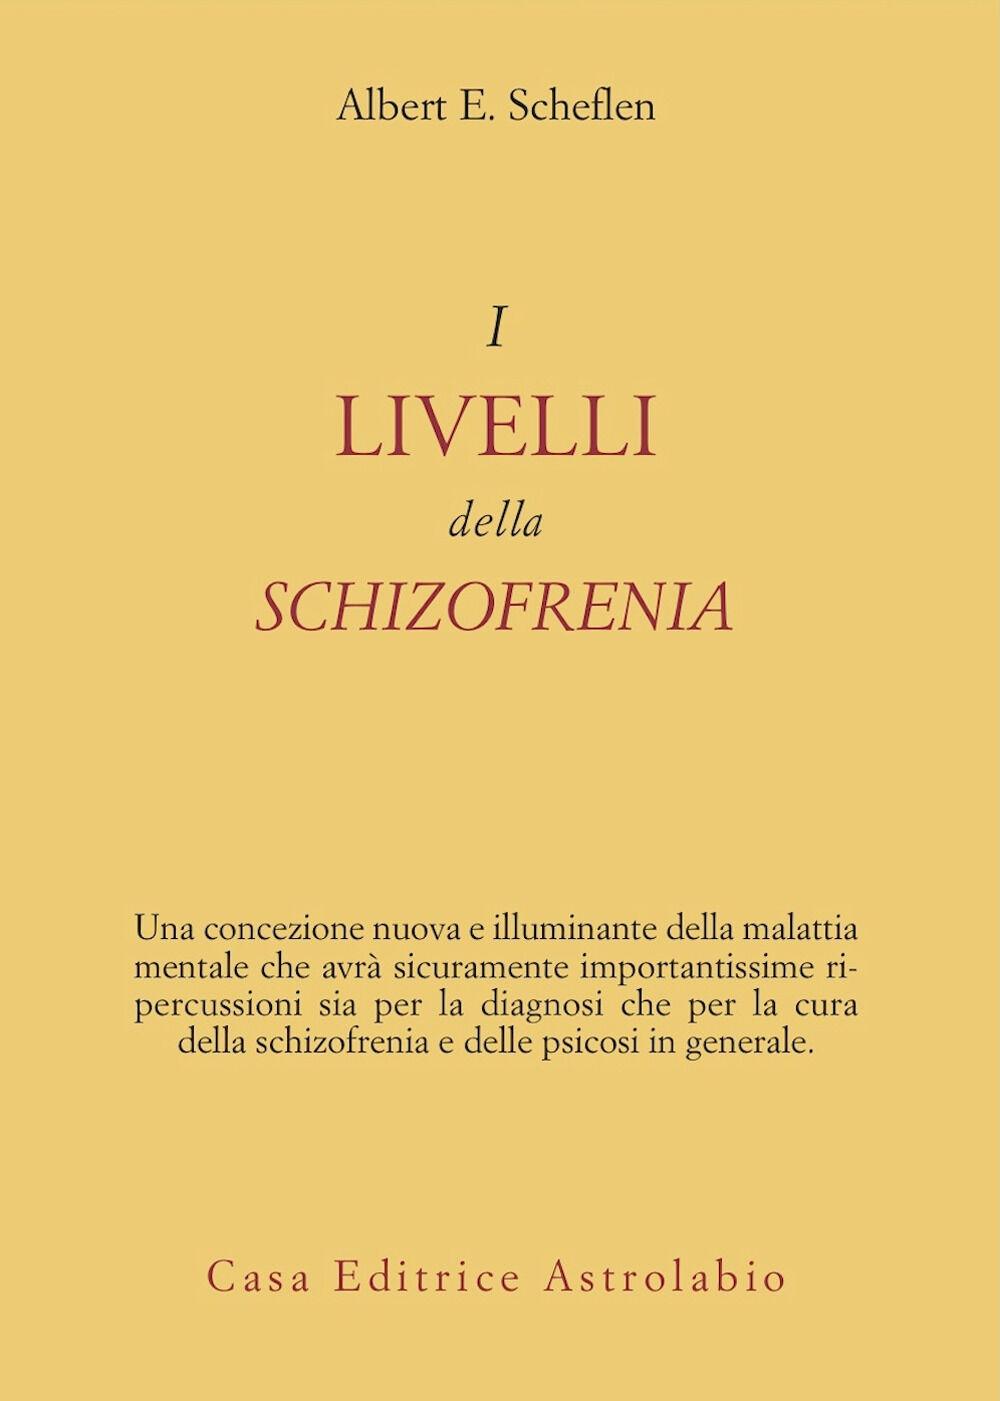 I livelli della schizofrenia